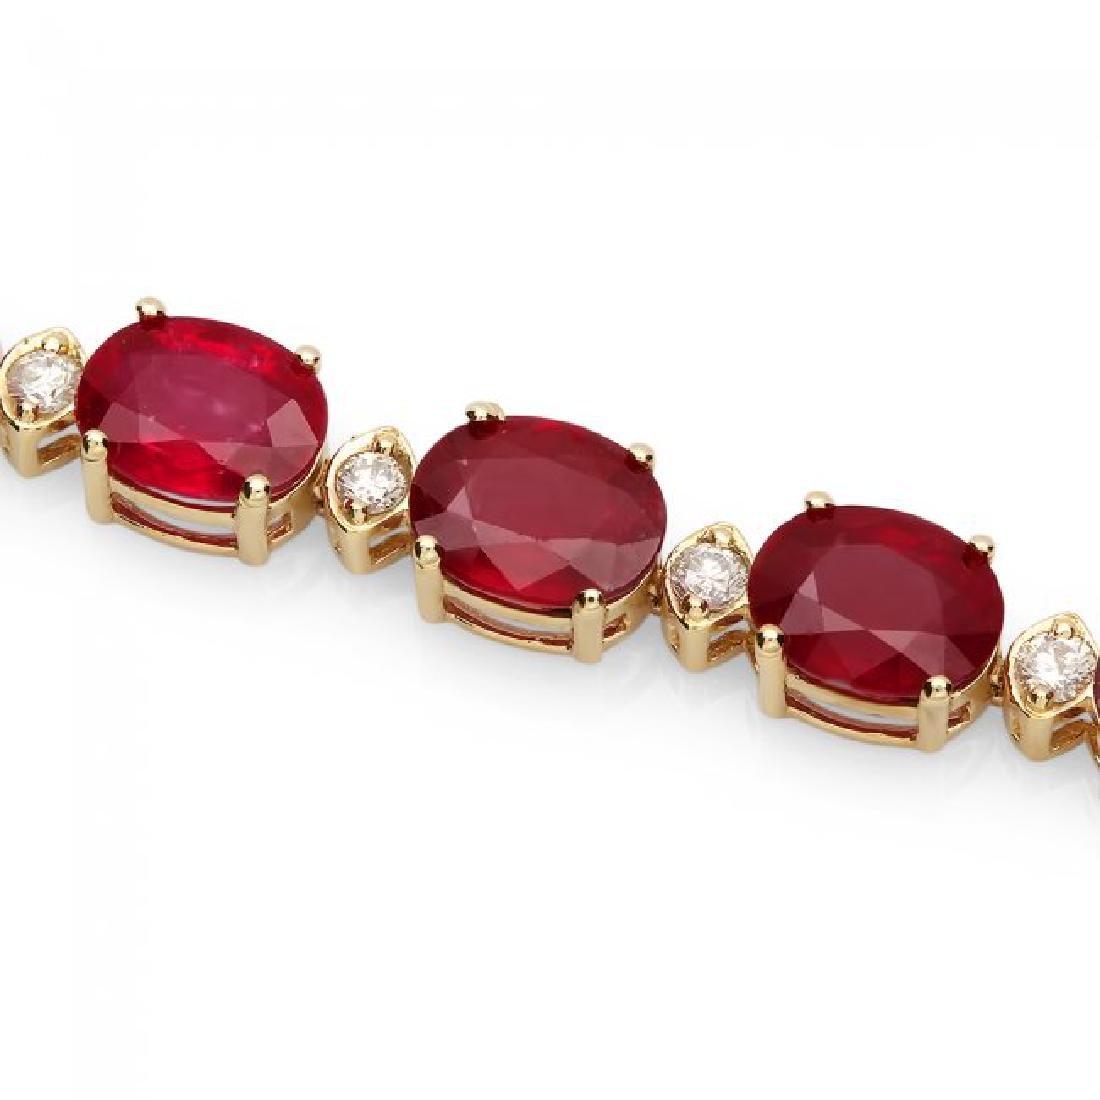 14k Gold 34.50ct Ruby 1.15ct Diamond Bracelet - 2